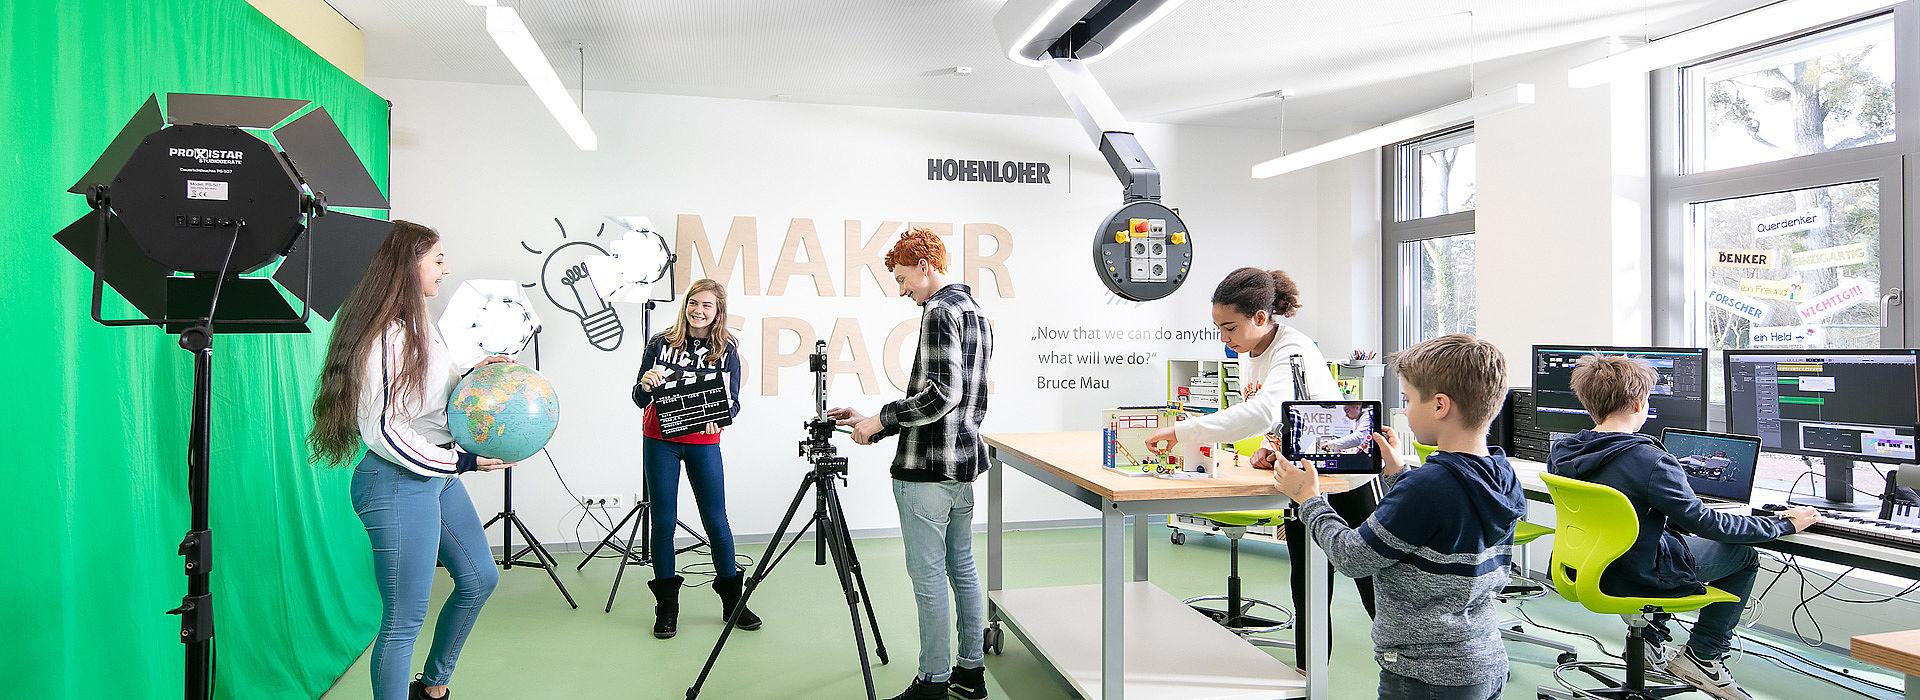 Bild: Video Production im Makerspace